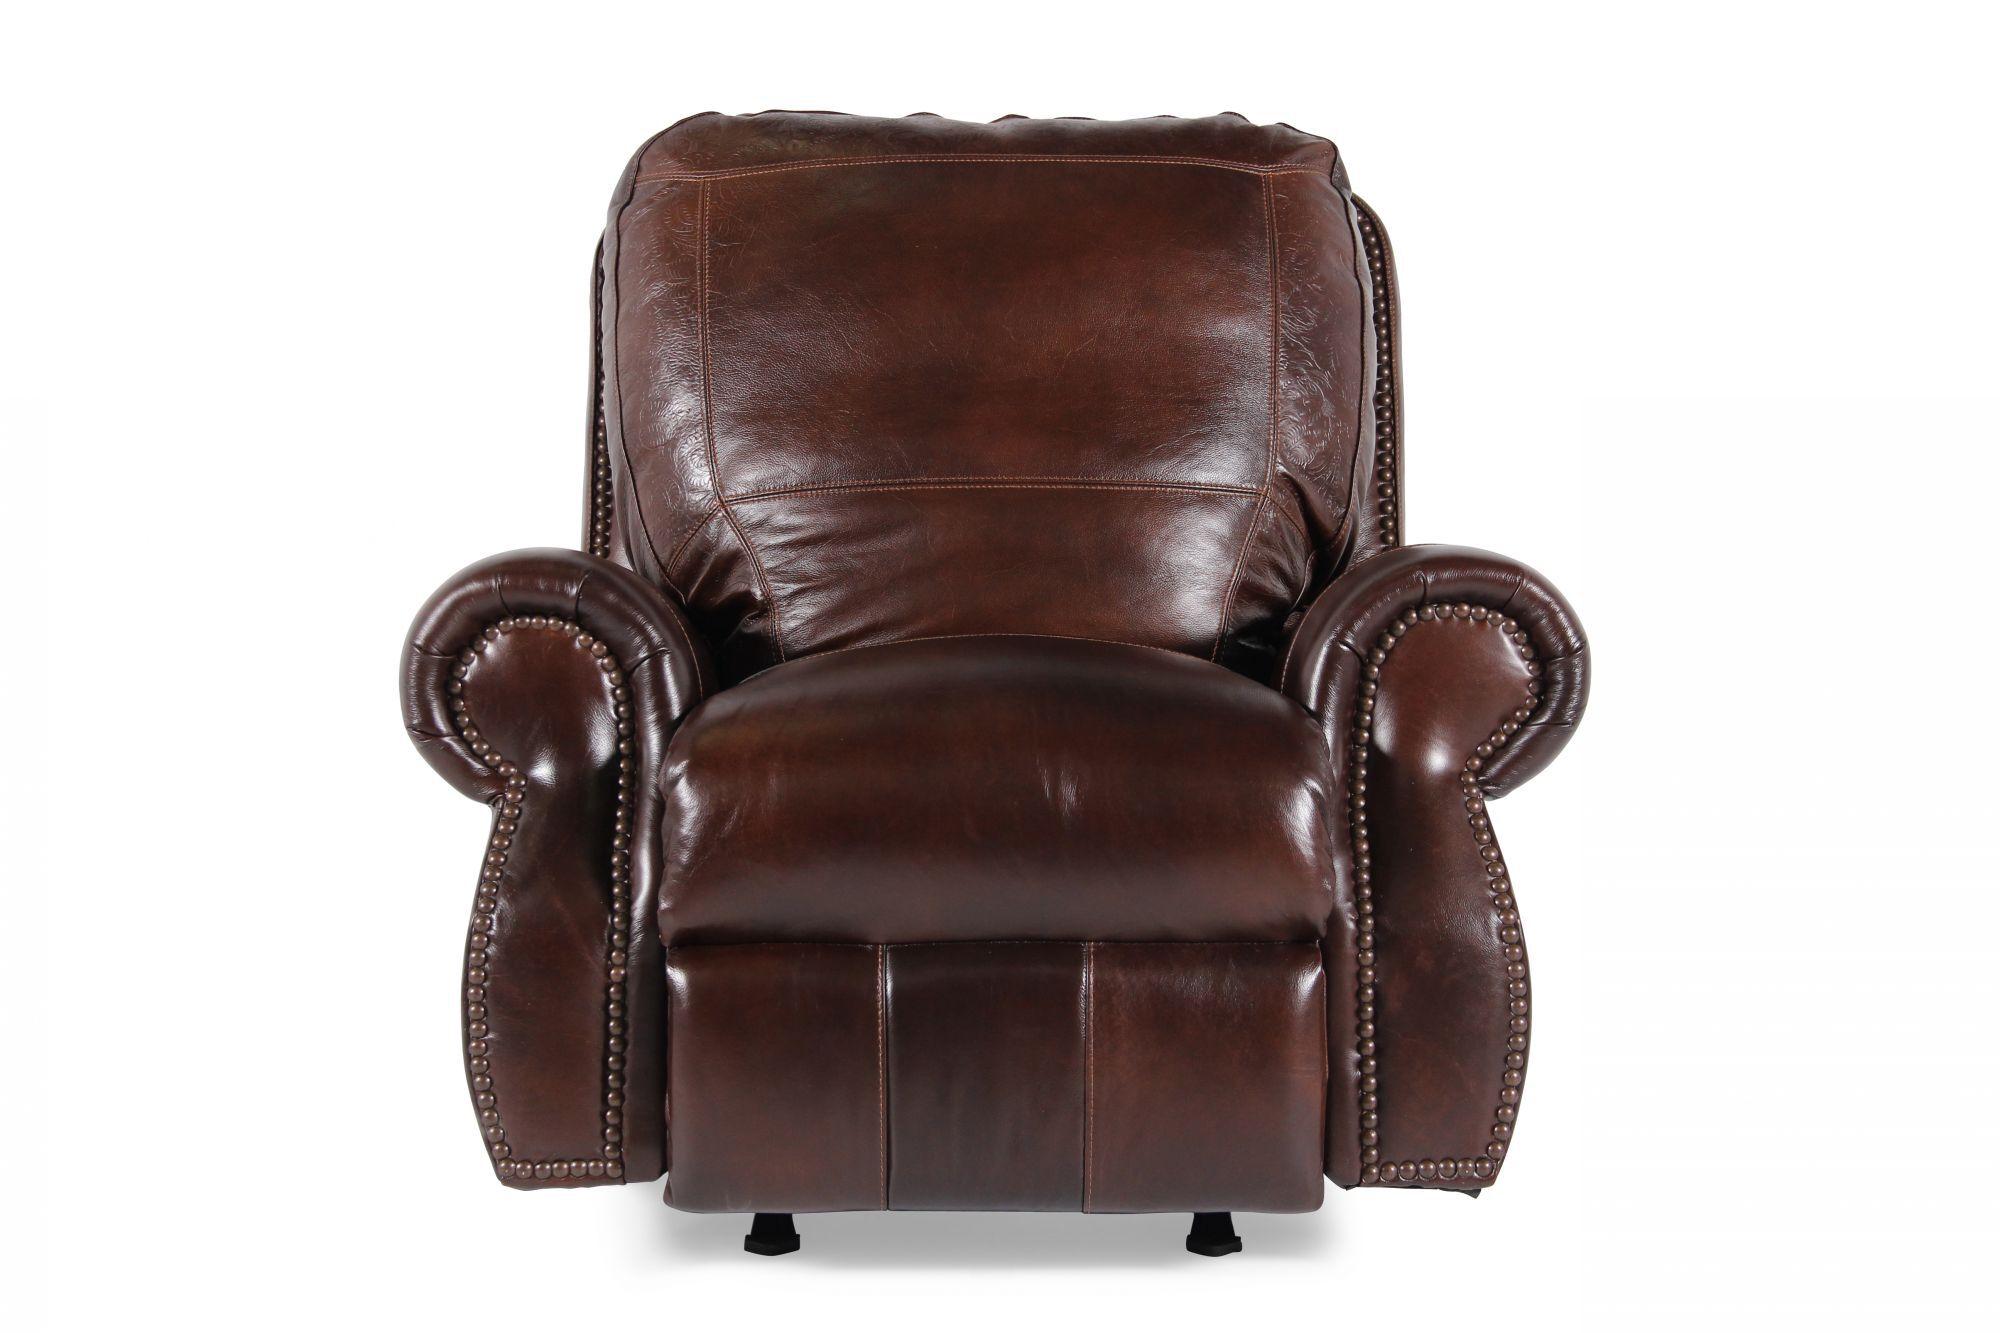 USA Leather Oak Paisley Recliner  sc 1 st  Mathis Brothers & USA Leather Oak Paisley Recliner | Mathis Brothers Furniture islam-shia.org